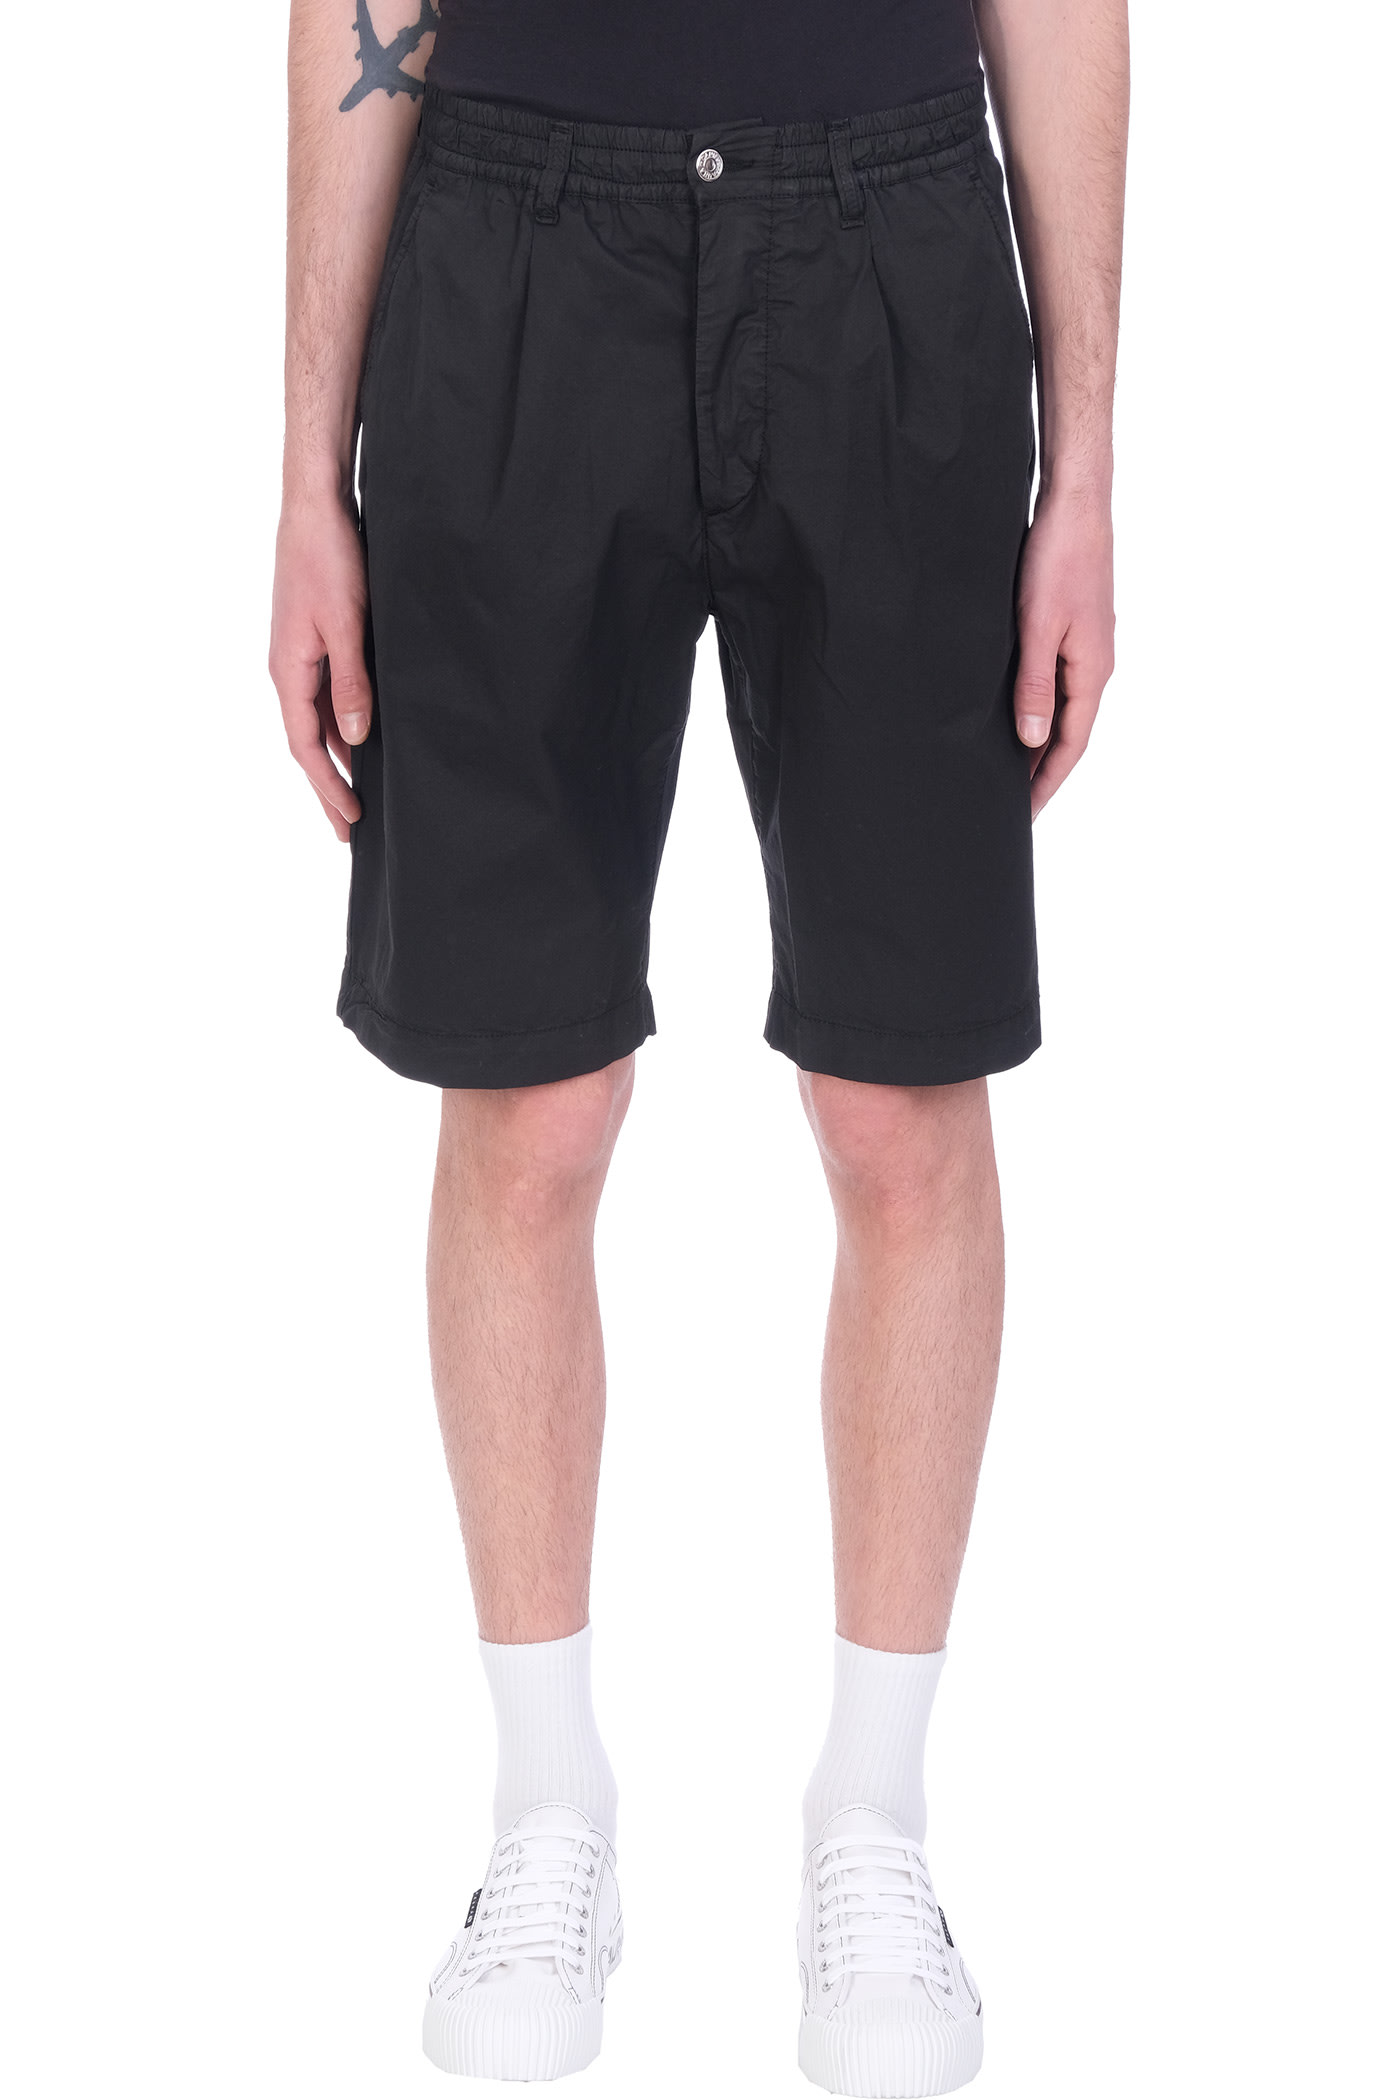 Harrison Shorts In Black Cotton